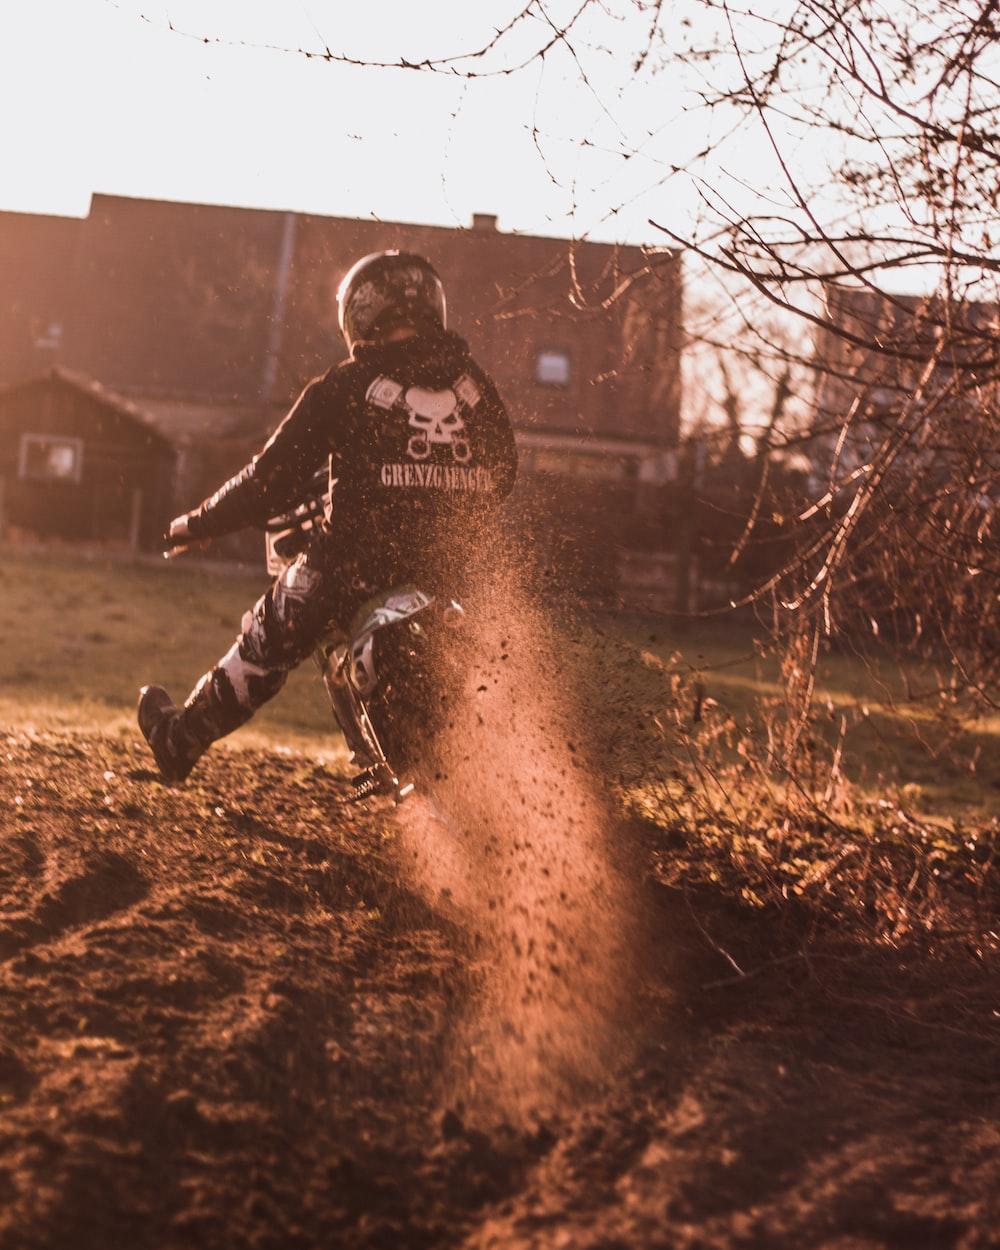 person riding dirt bike during daytime